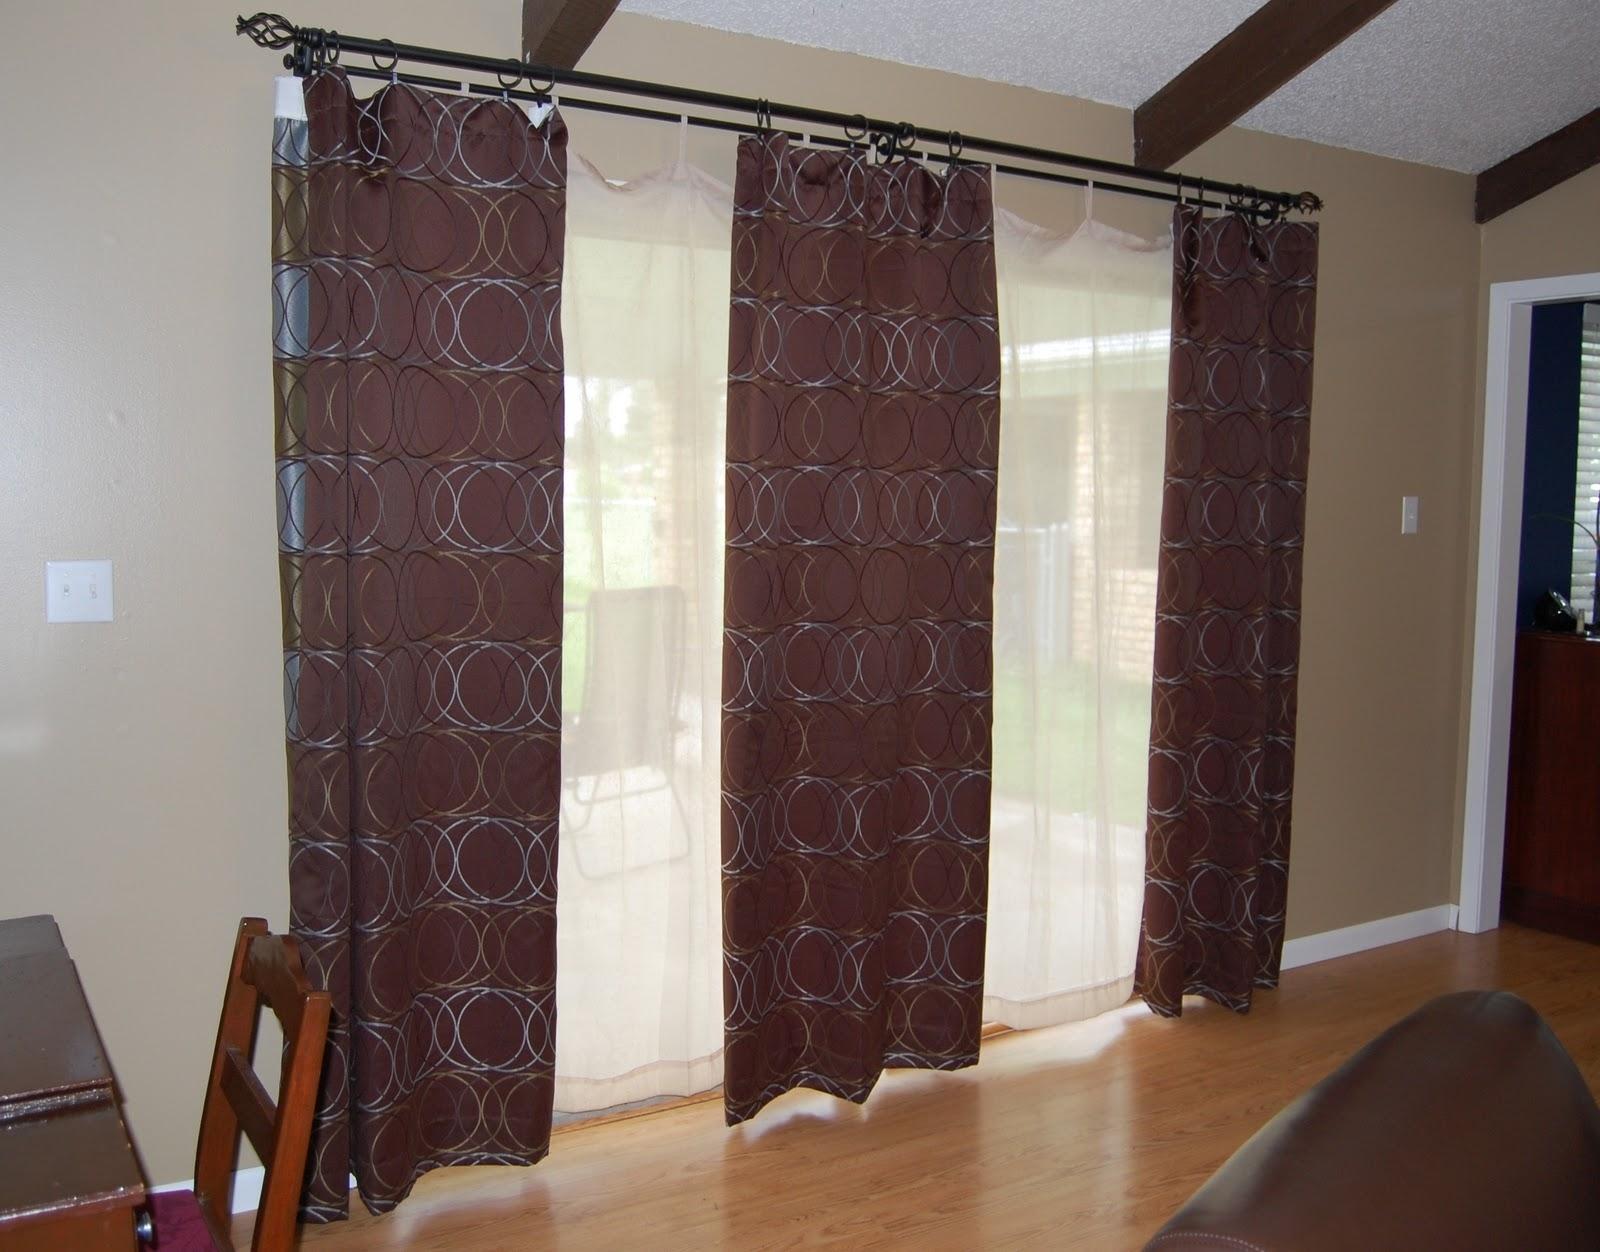 3 Panel Sliding Glass Door Curtainscurtains konica minolta digital camera blackout patio door